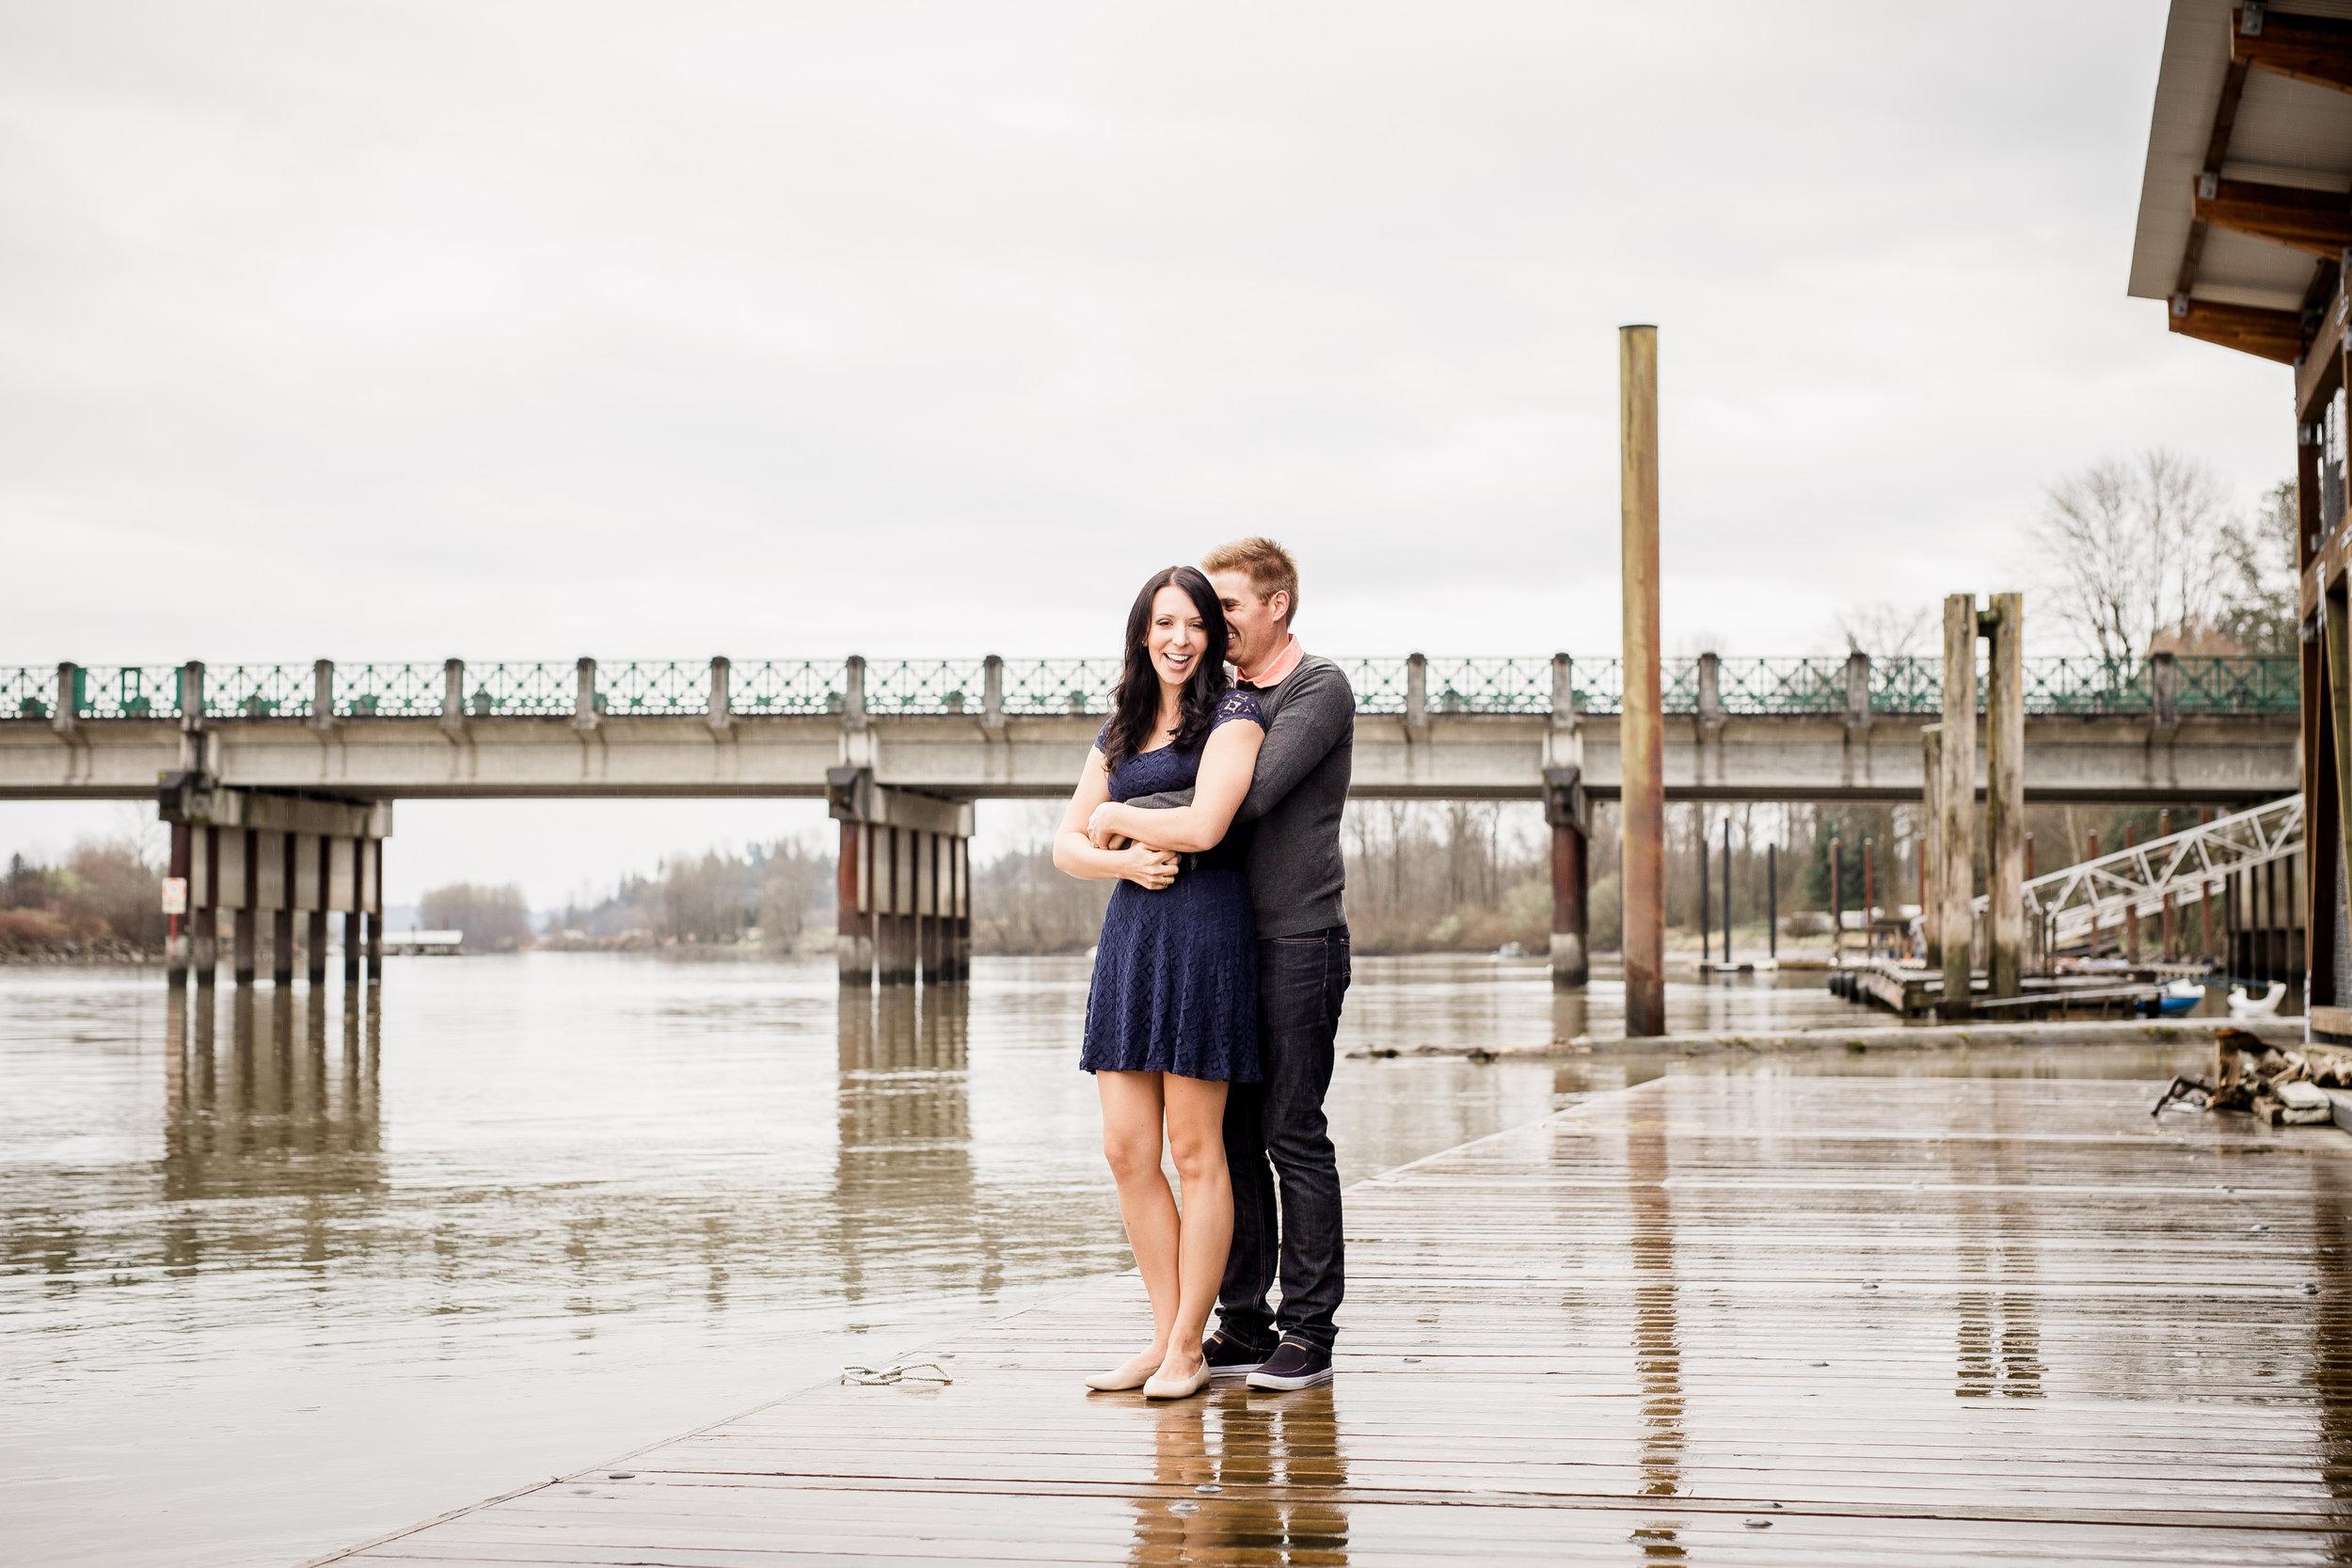 Langley Photographer, Fort Langley Engagement, Amanda Coldicutt Photography, Langley Wedding Photographer